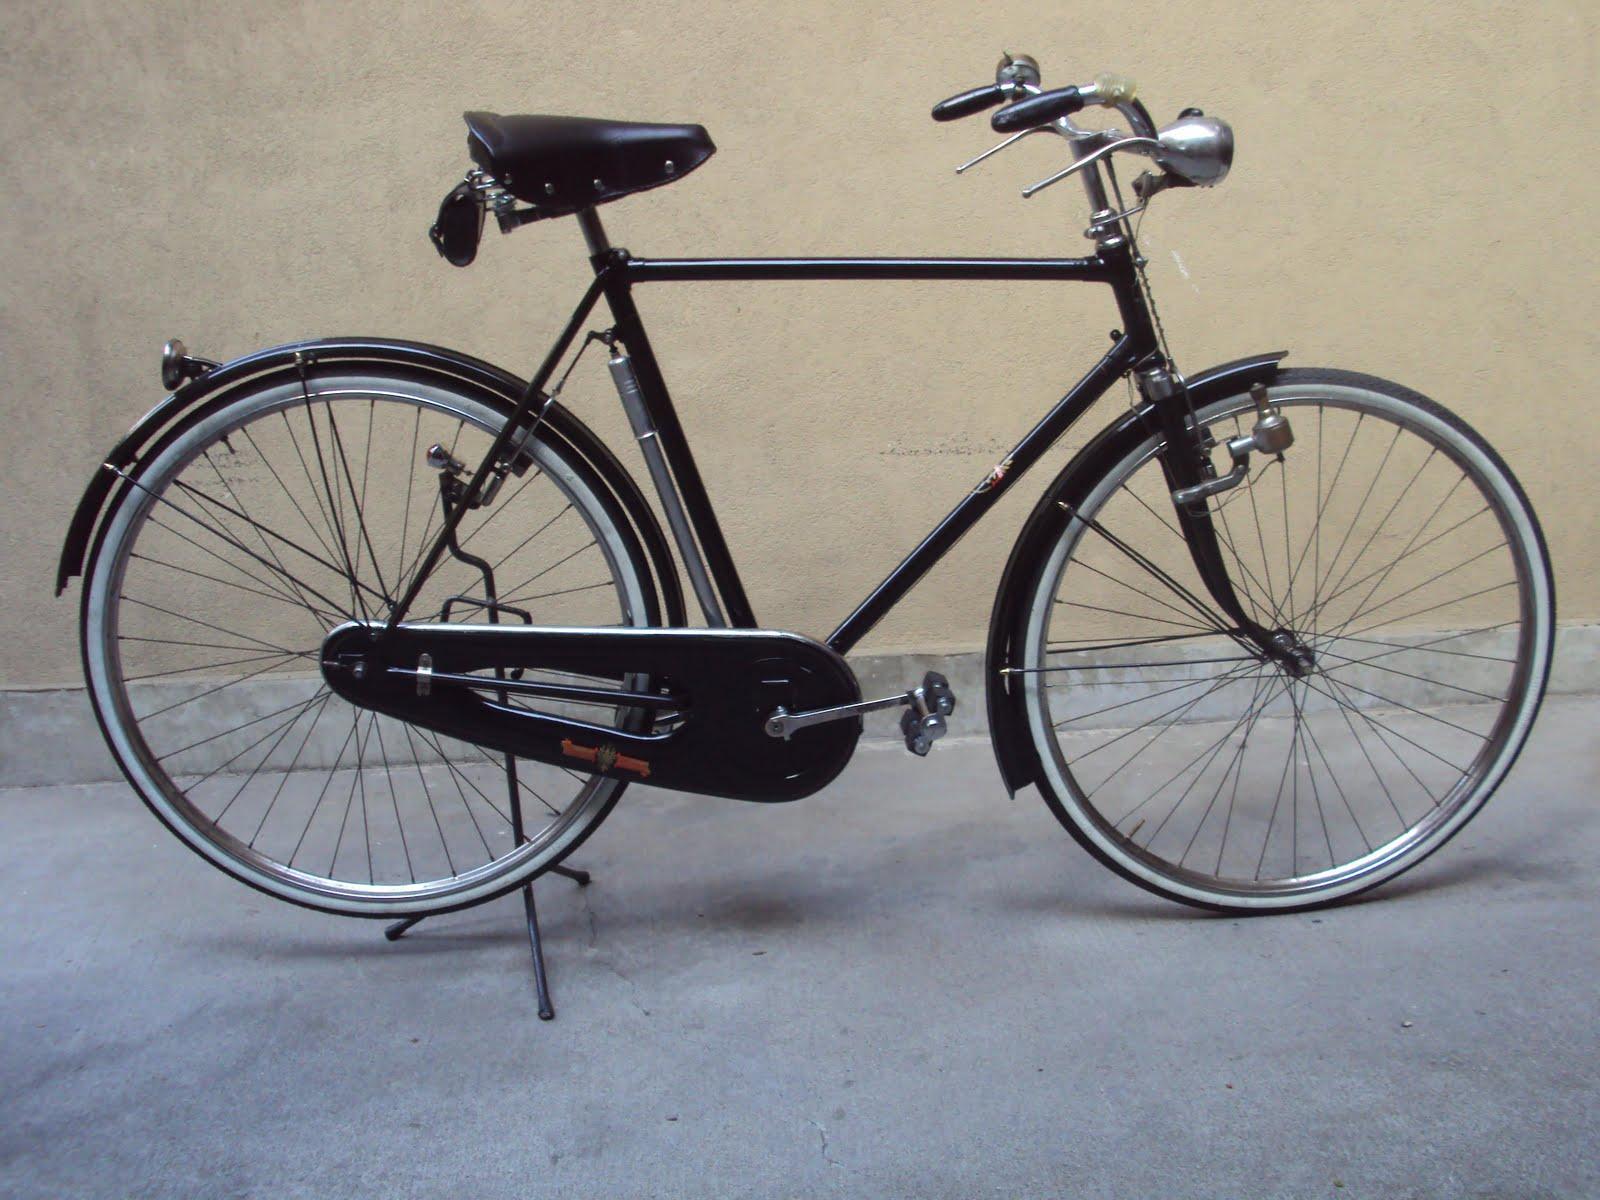 Bicicletta Bianchi Anni 50 Valore